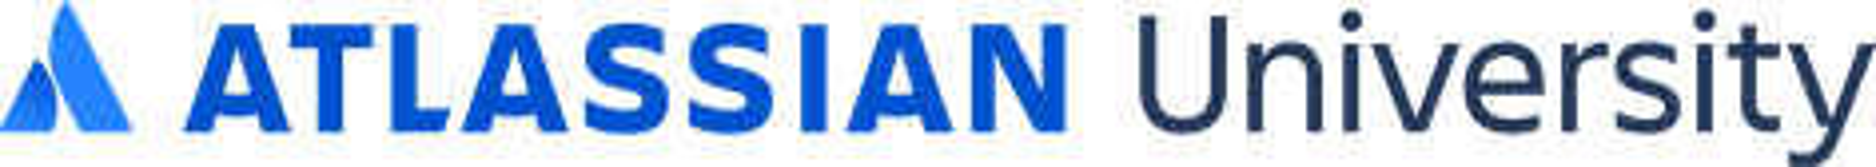 Atlassian University-blue-rgb@2x.png